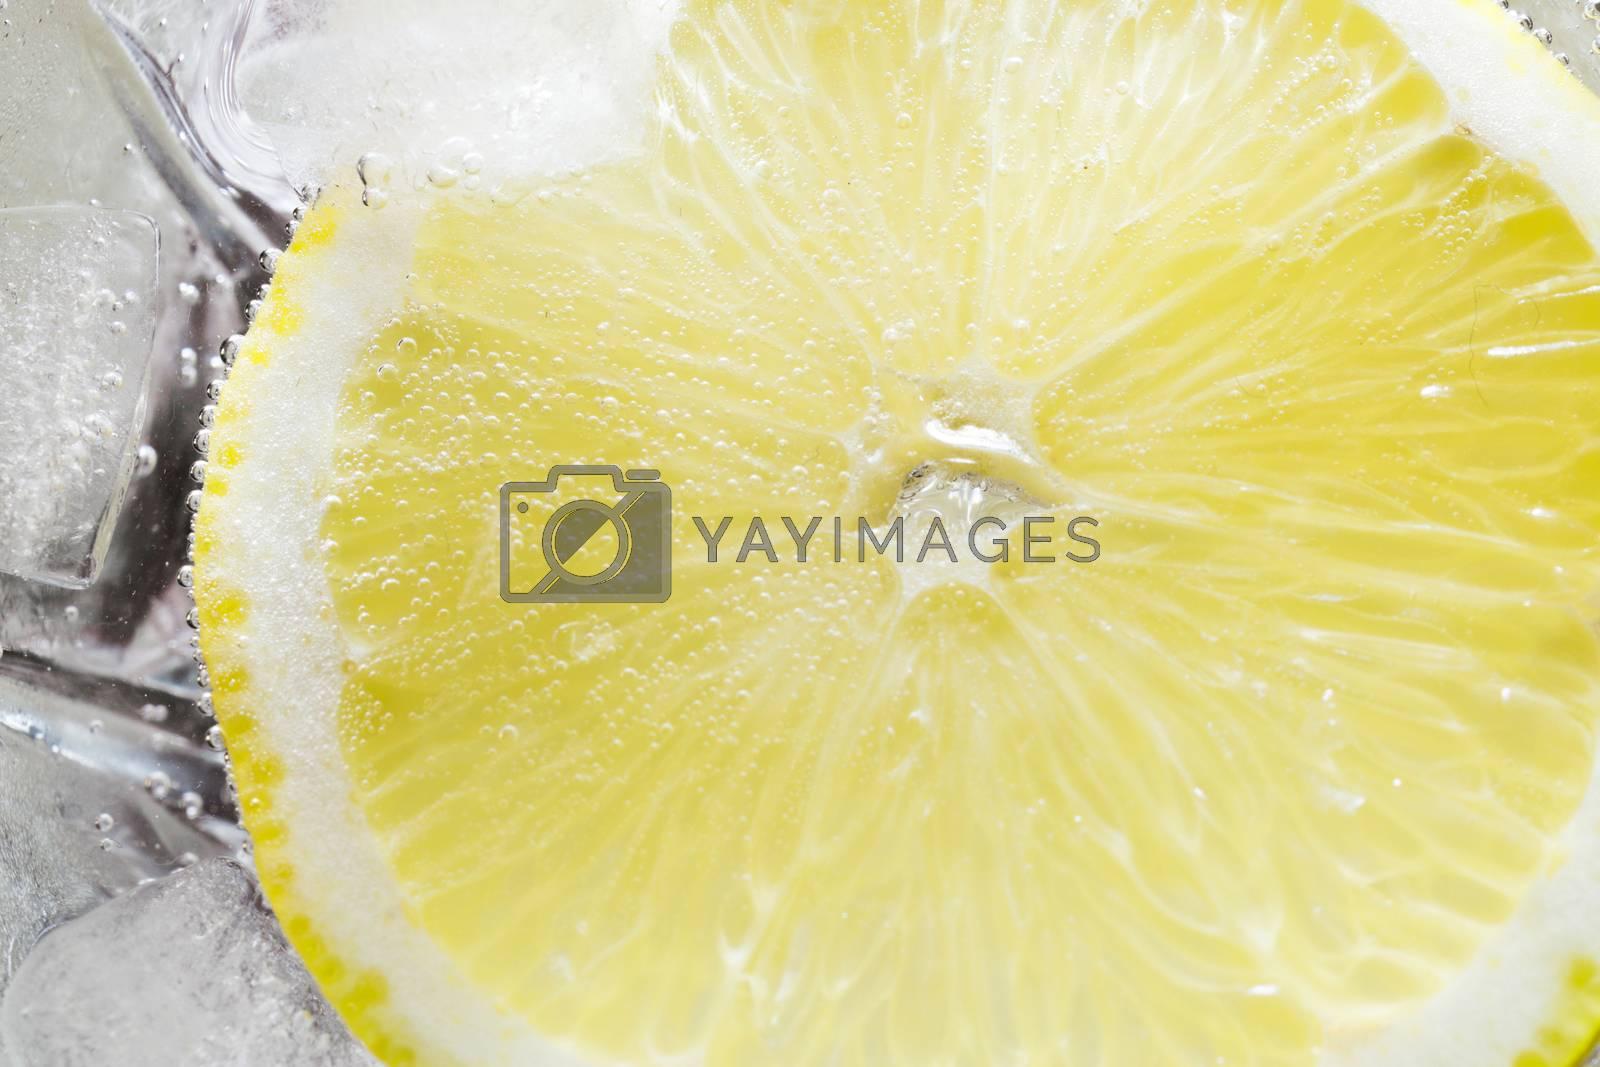 The photo depicts a lemon in bubbles